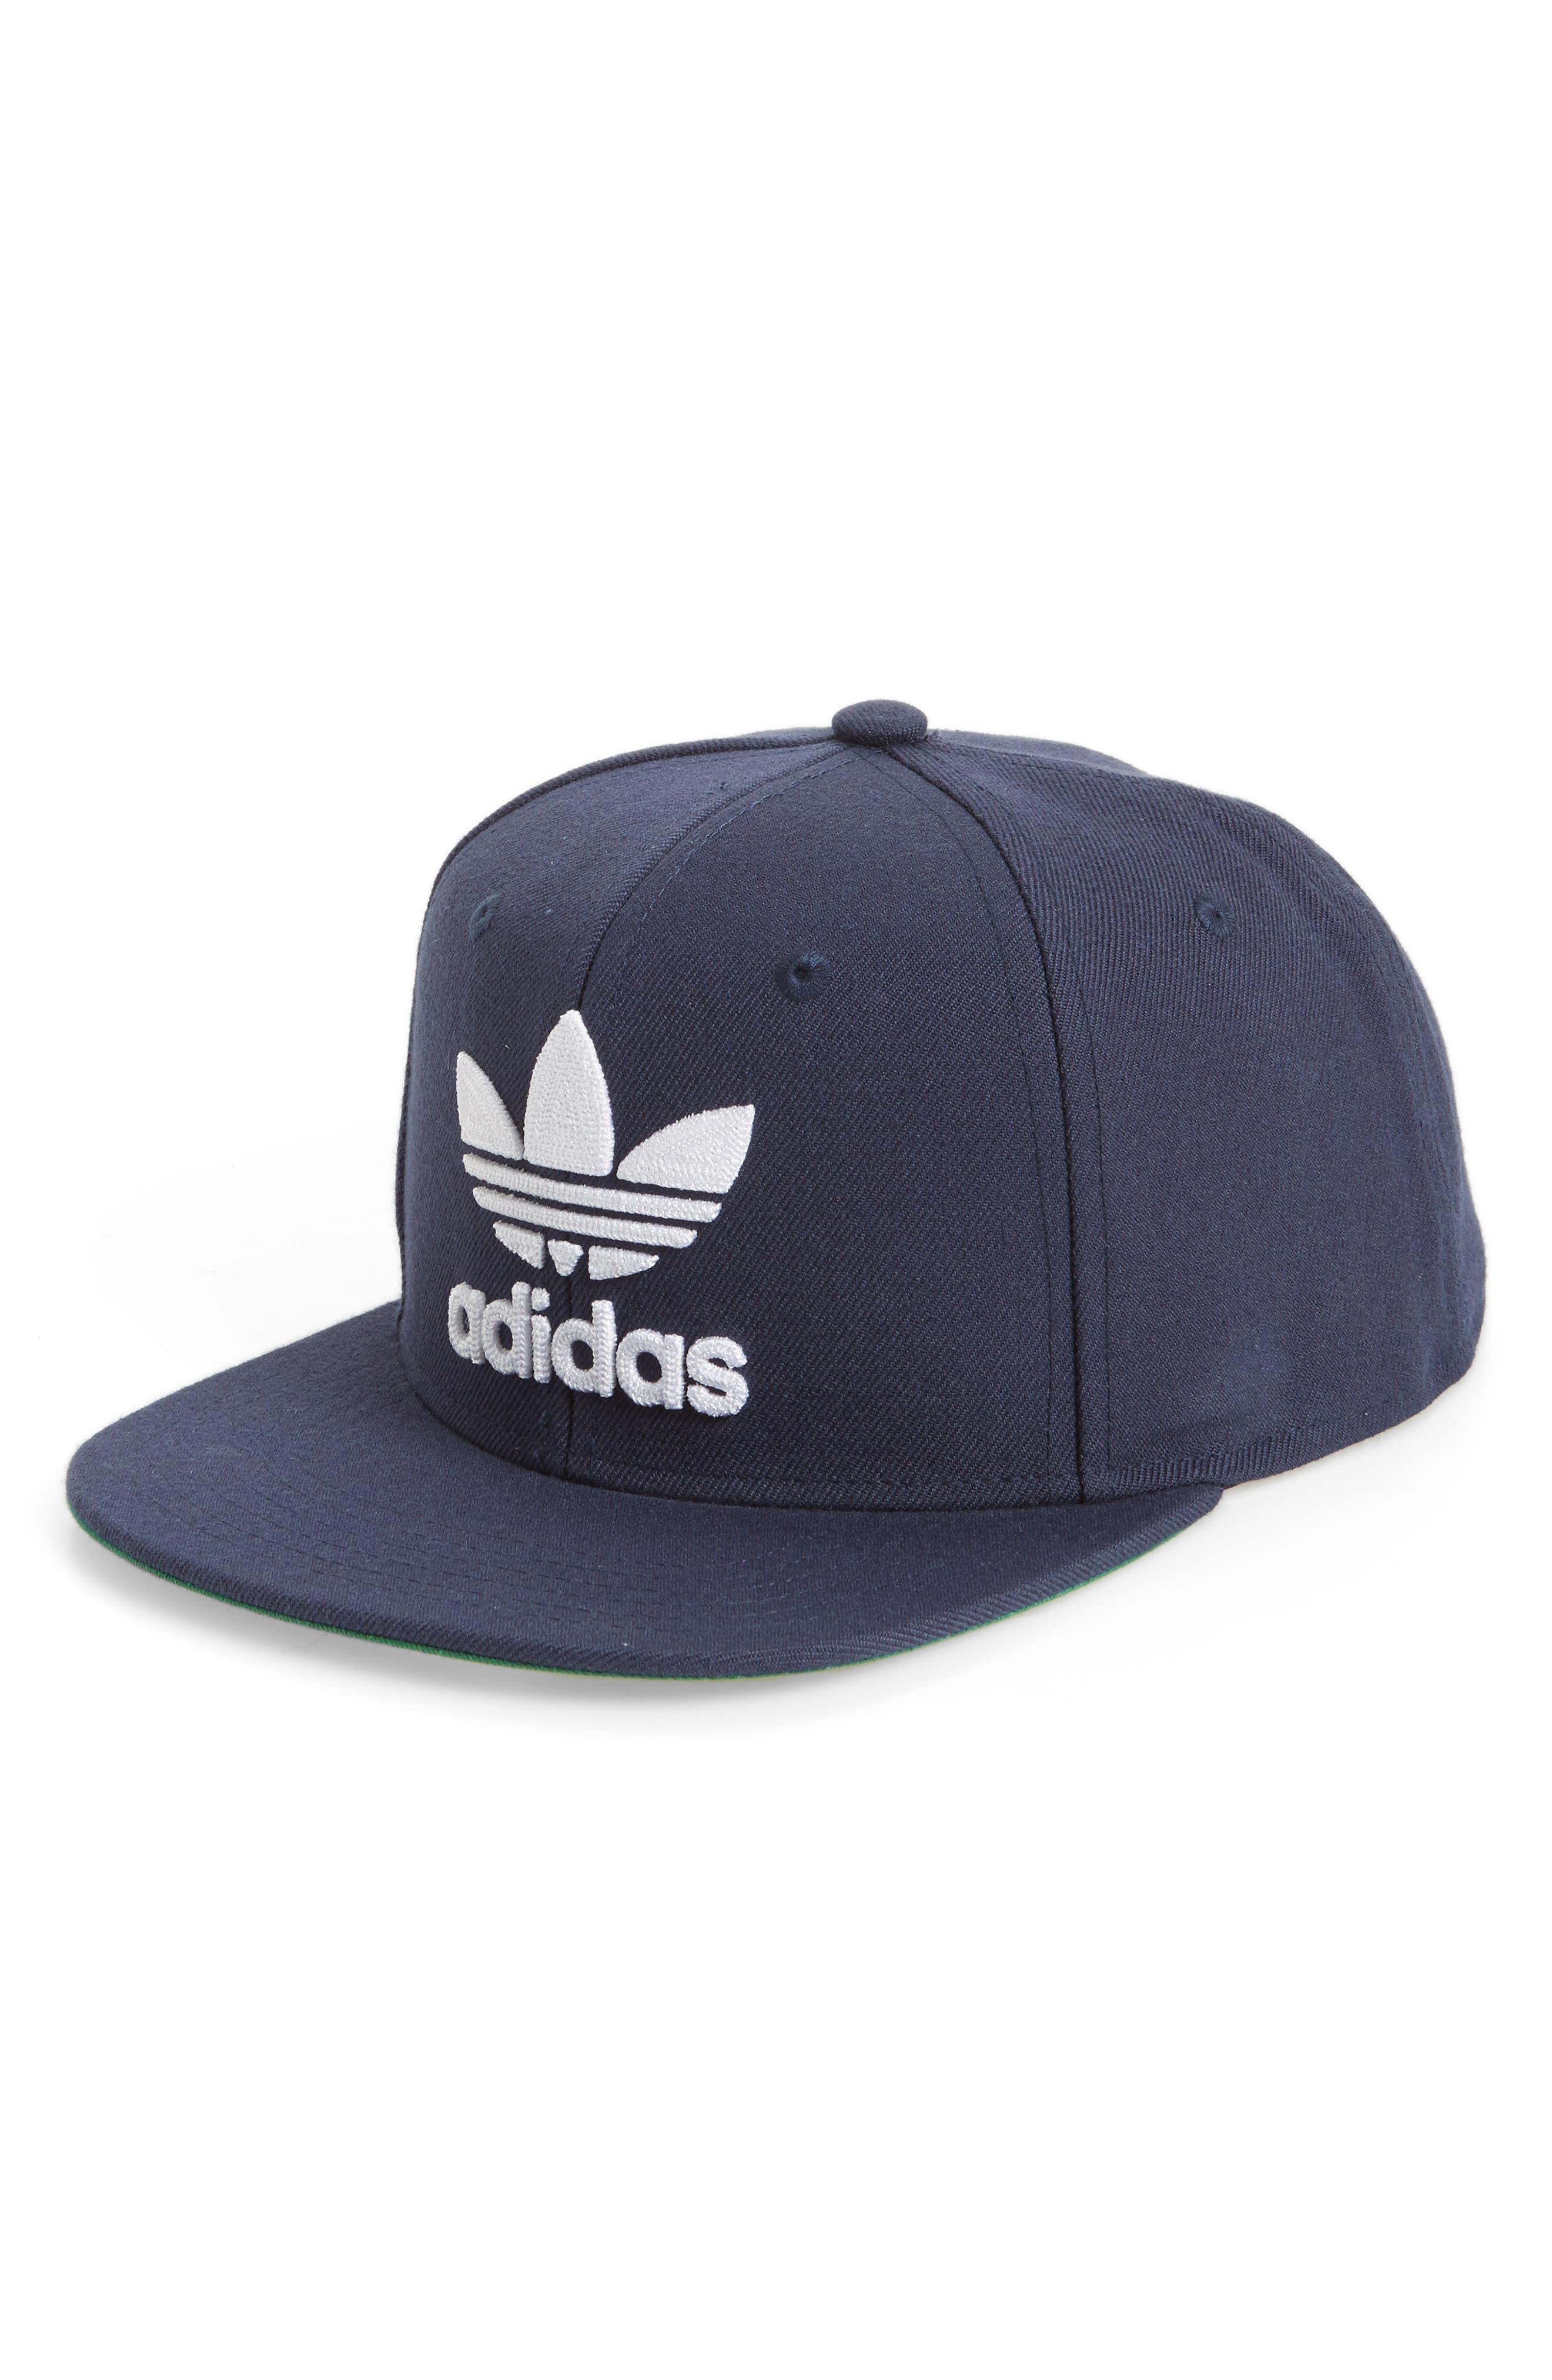 adidas Trefoil Chain Snapback Baseball Cap